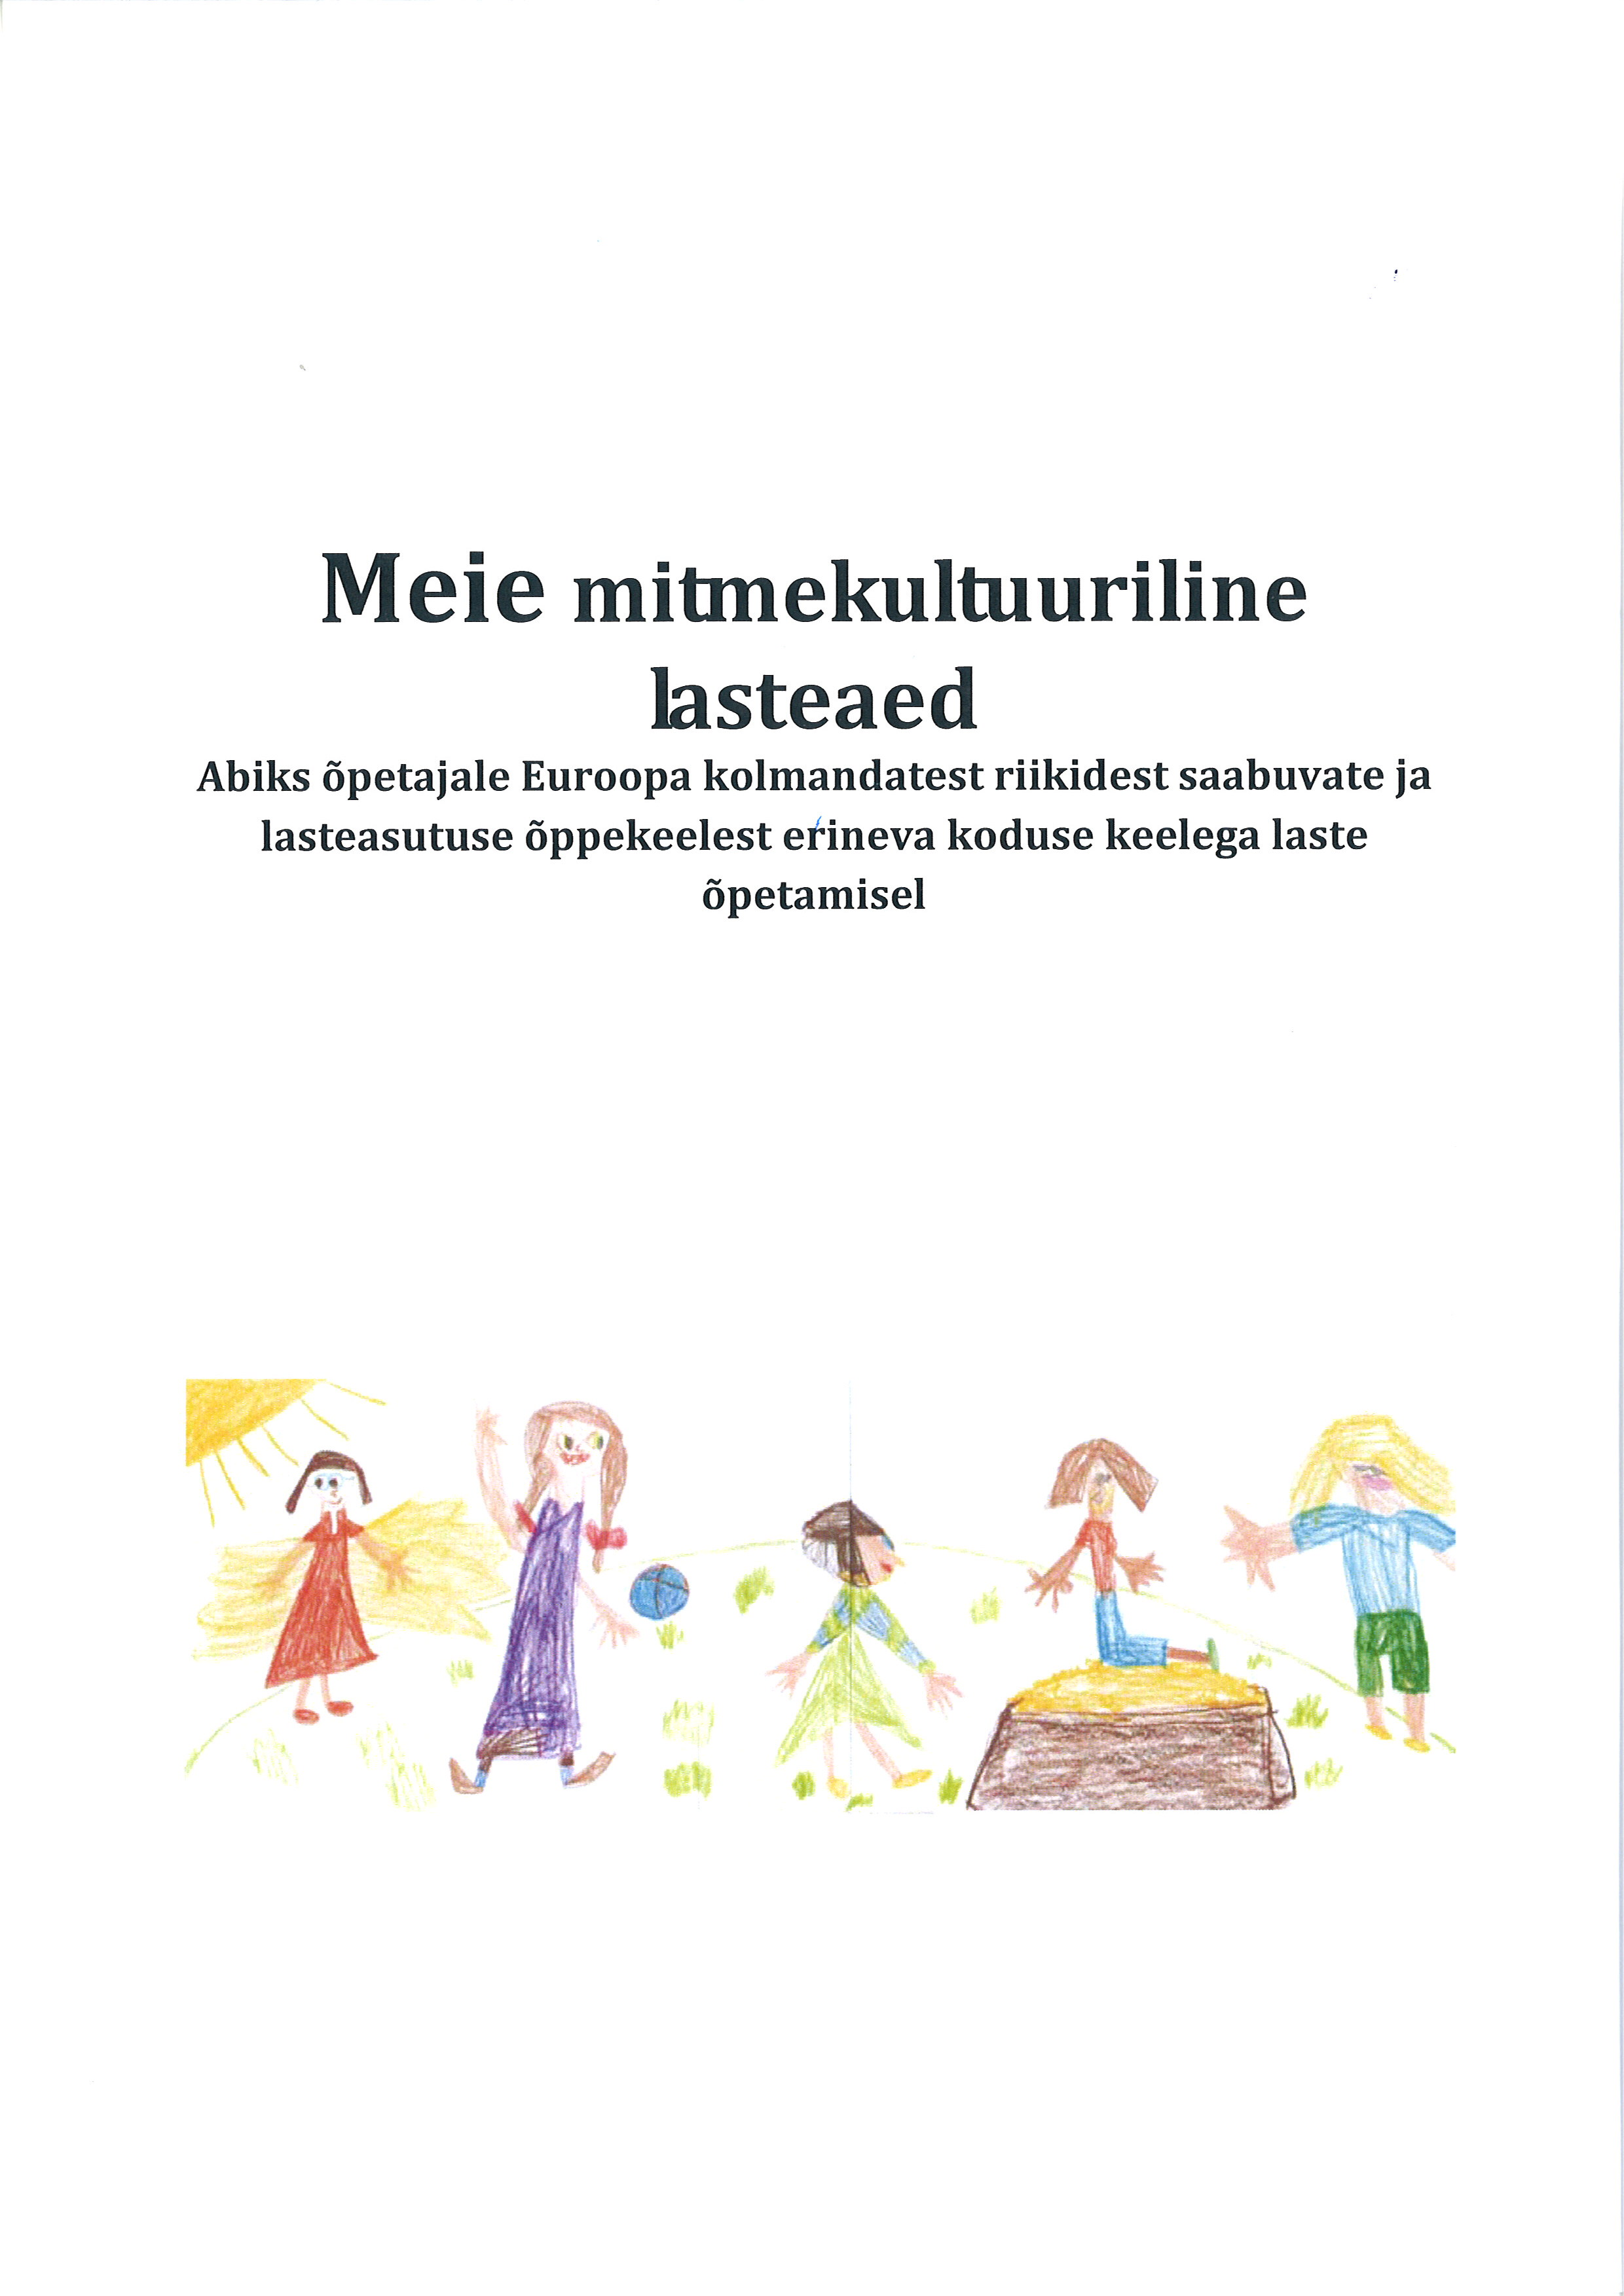 <dt>Title: </dt><dd> Meie mitmekultuuriline lasteaed</dd>